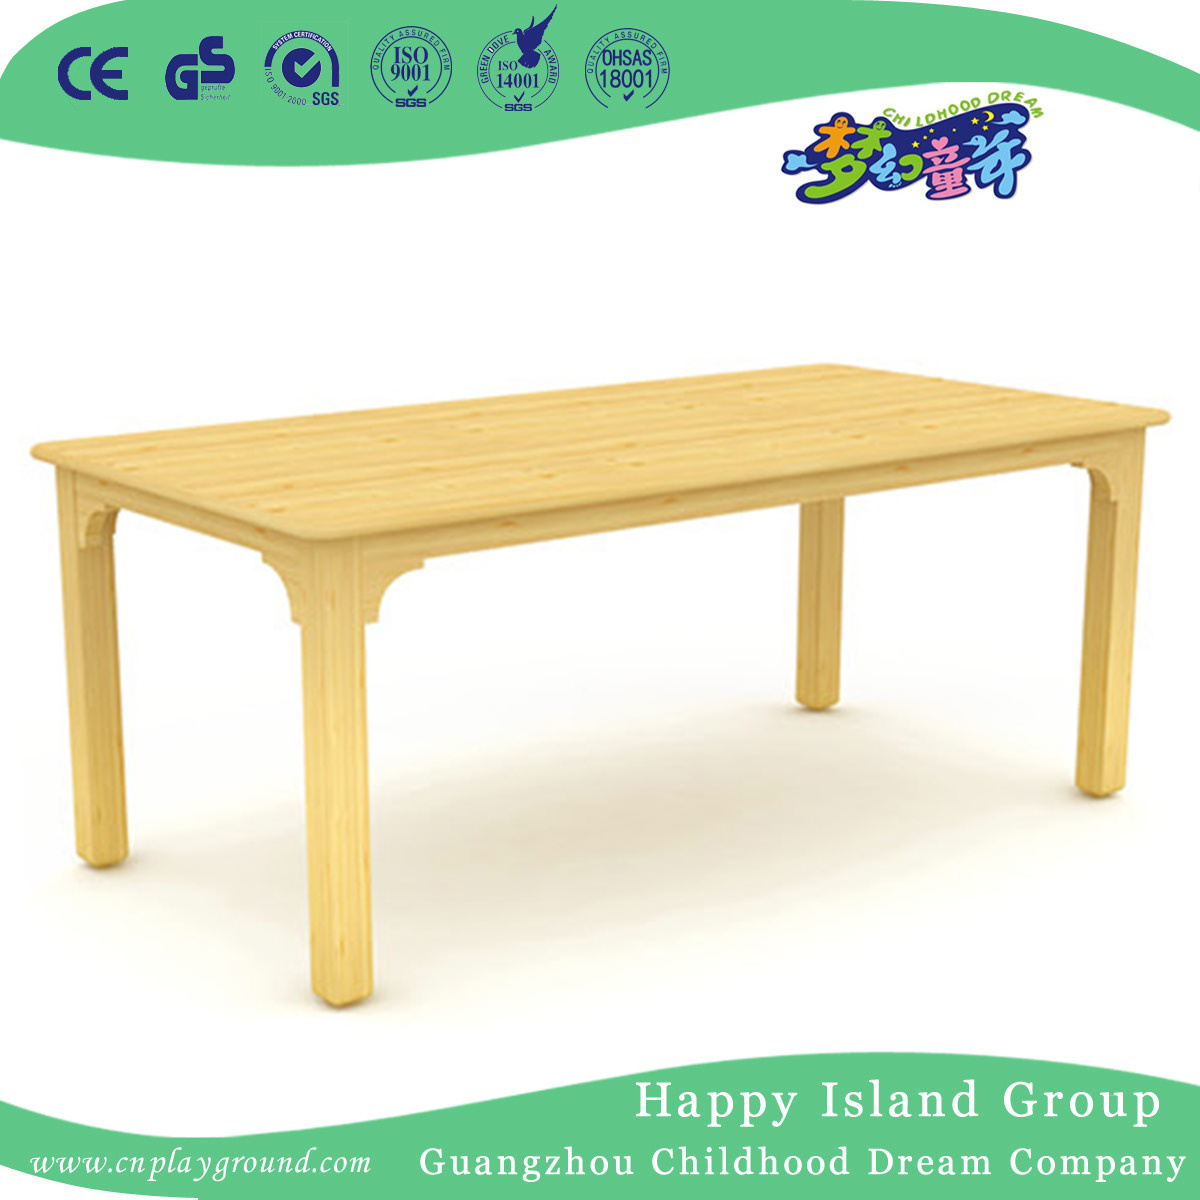 China School Children Wooden Rectangle Table Desk Furniture Hg 3902 Kindergarten Plastic Kids And Chair